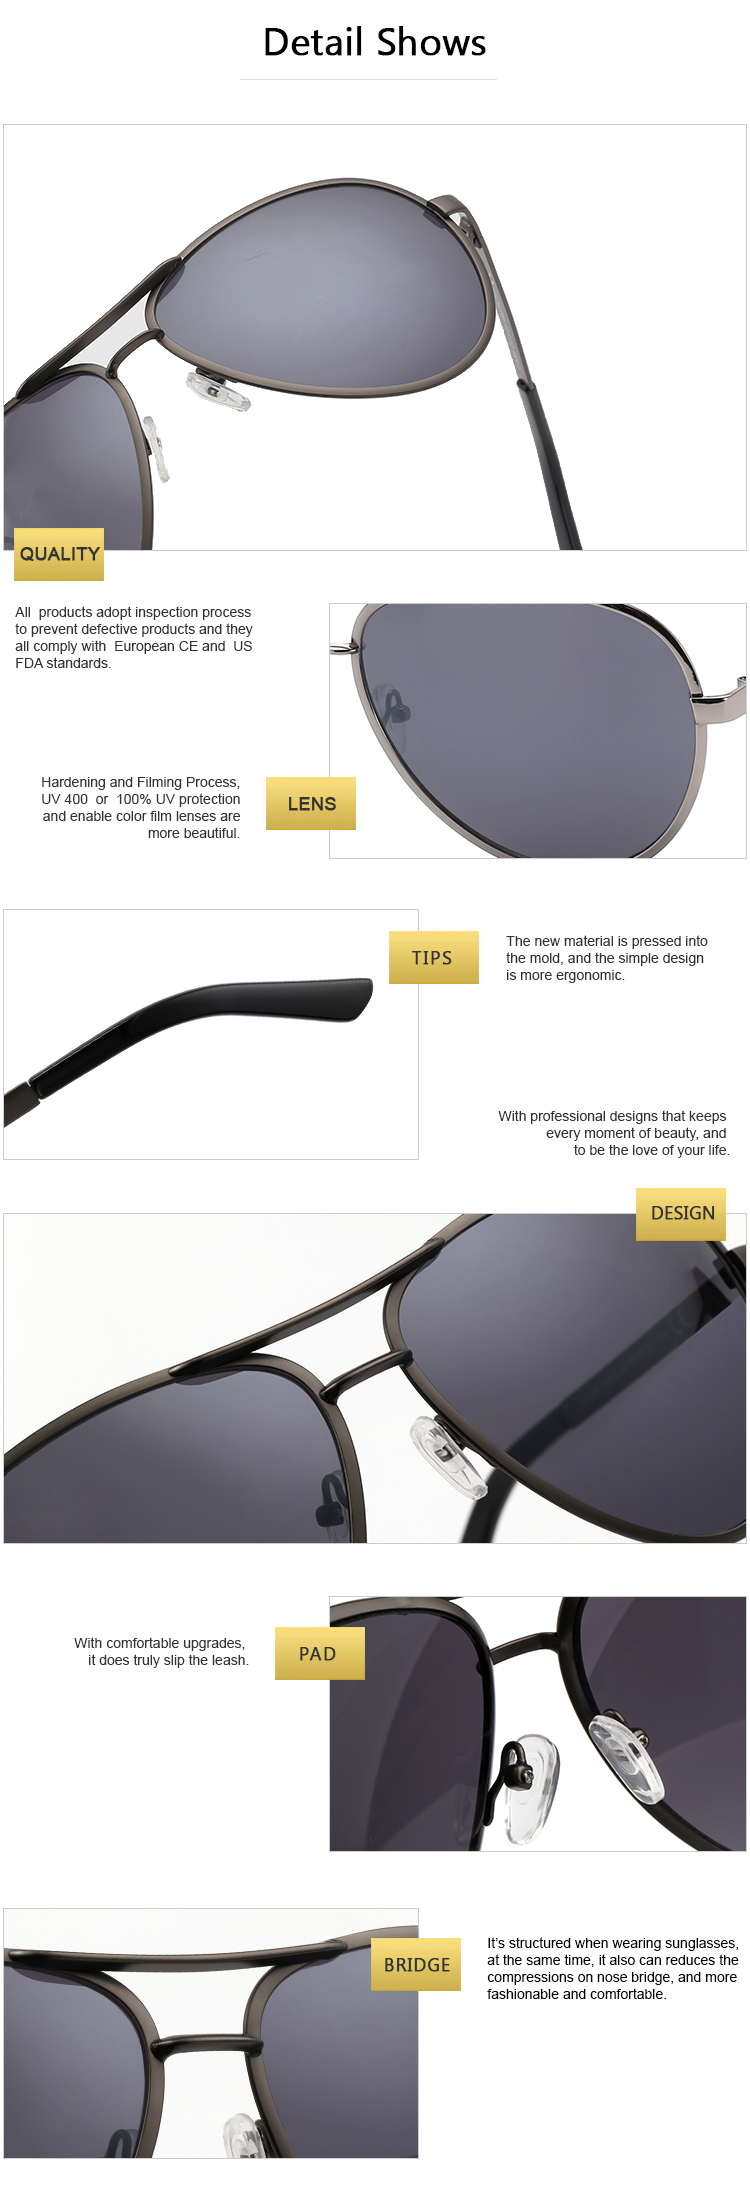 21d2ae2a08fe4 China the cheap sunglasses wholesale 🇨🇳 - Alibaba